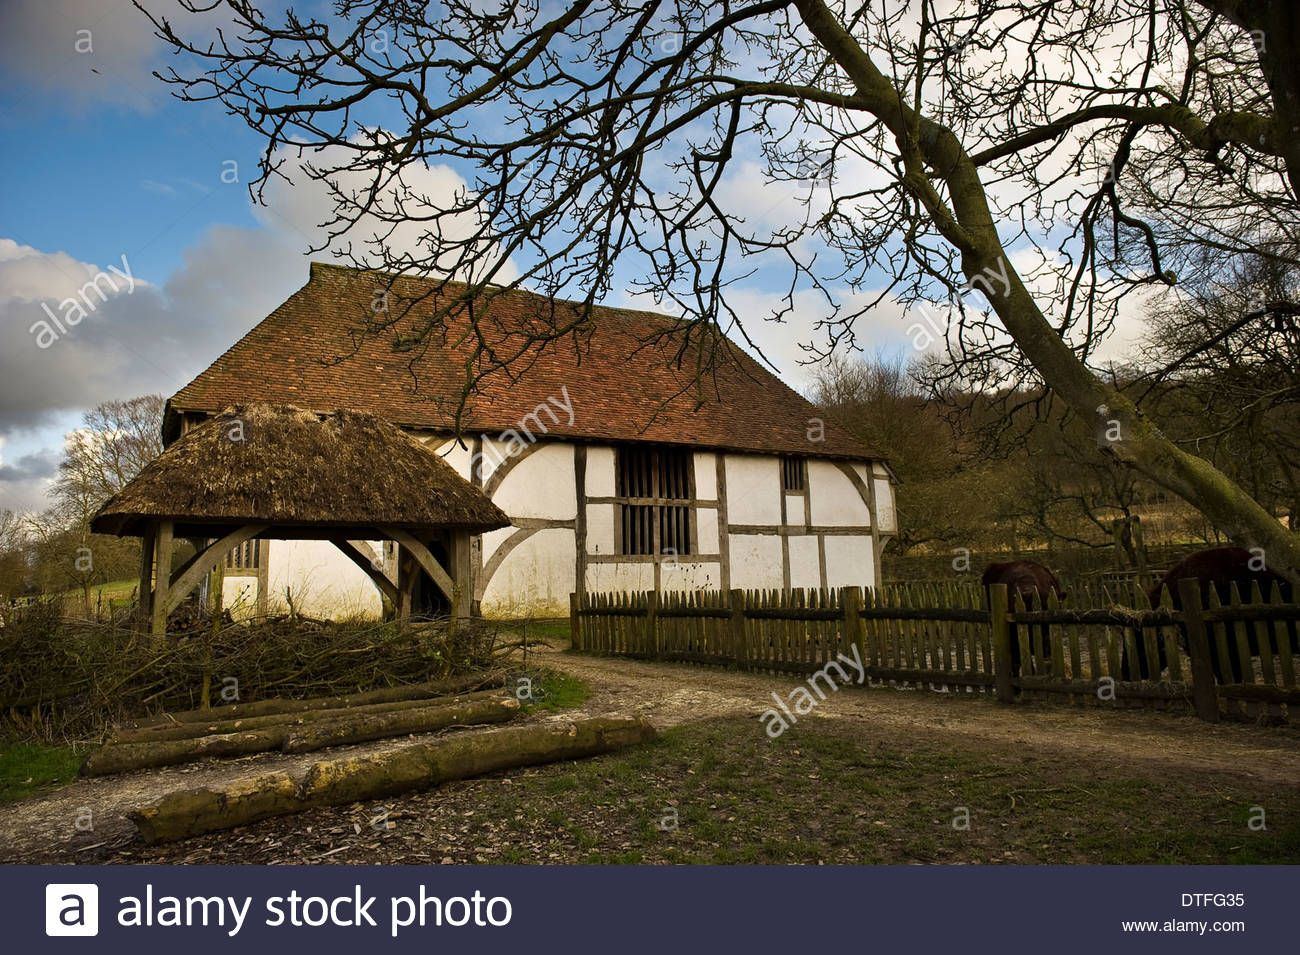 Bayleaf Wealden Farmhouse At The Weald & Downland Open Air